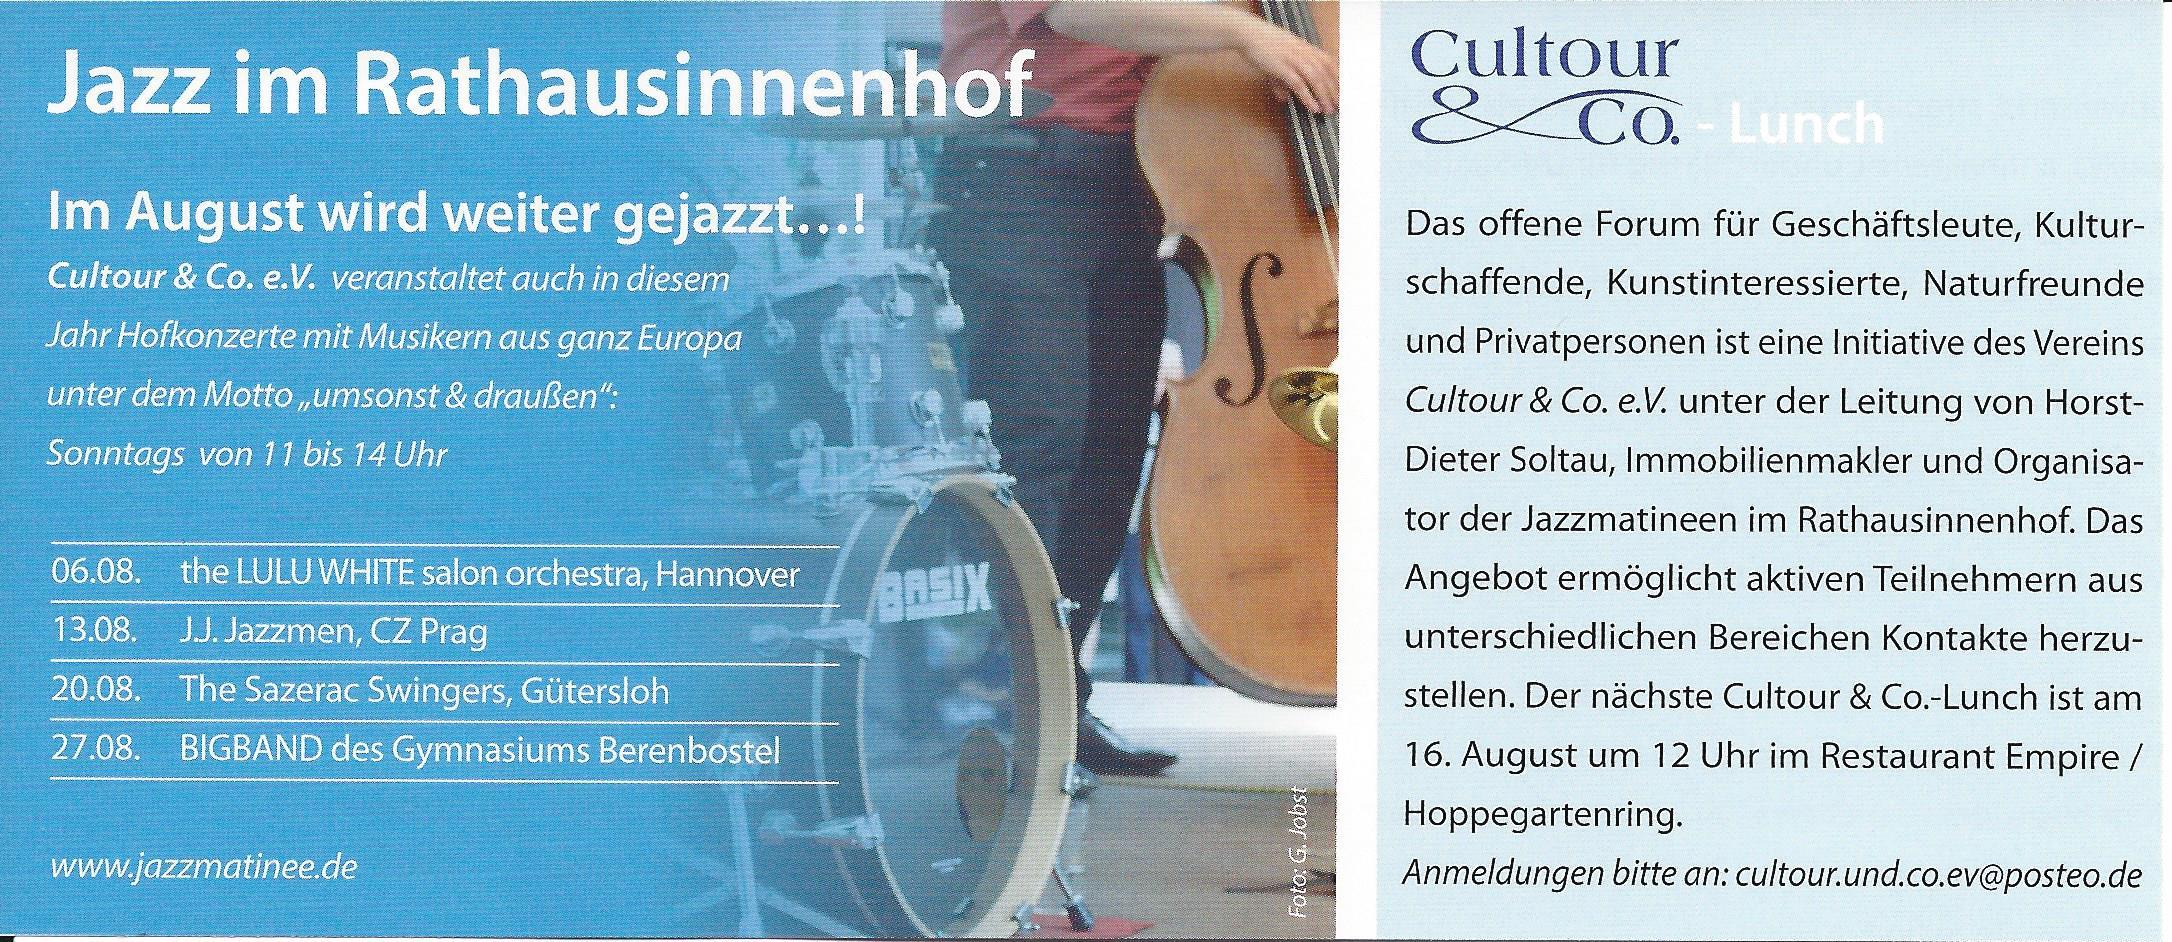 Jazz im Rathausinnenhof